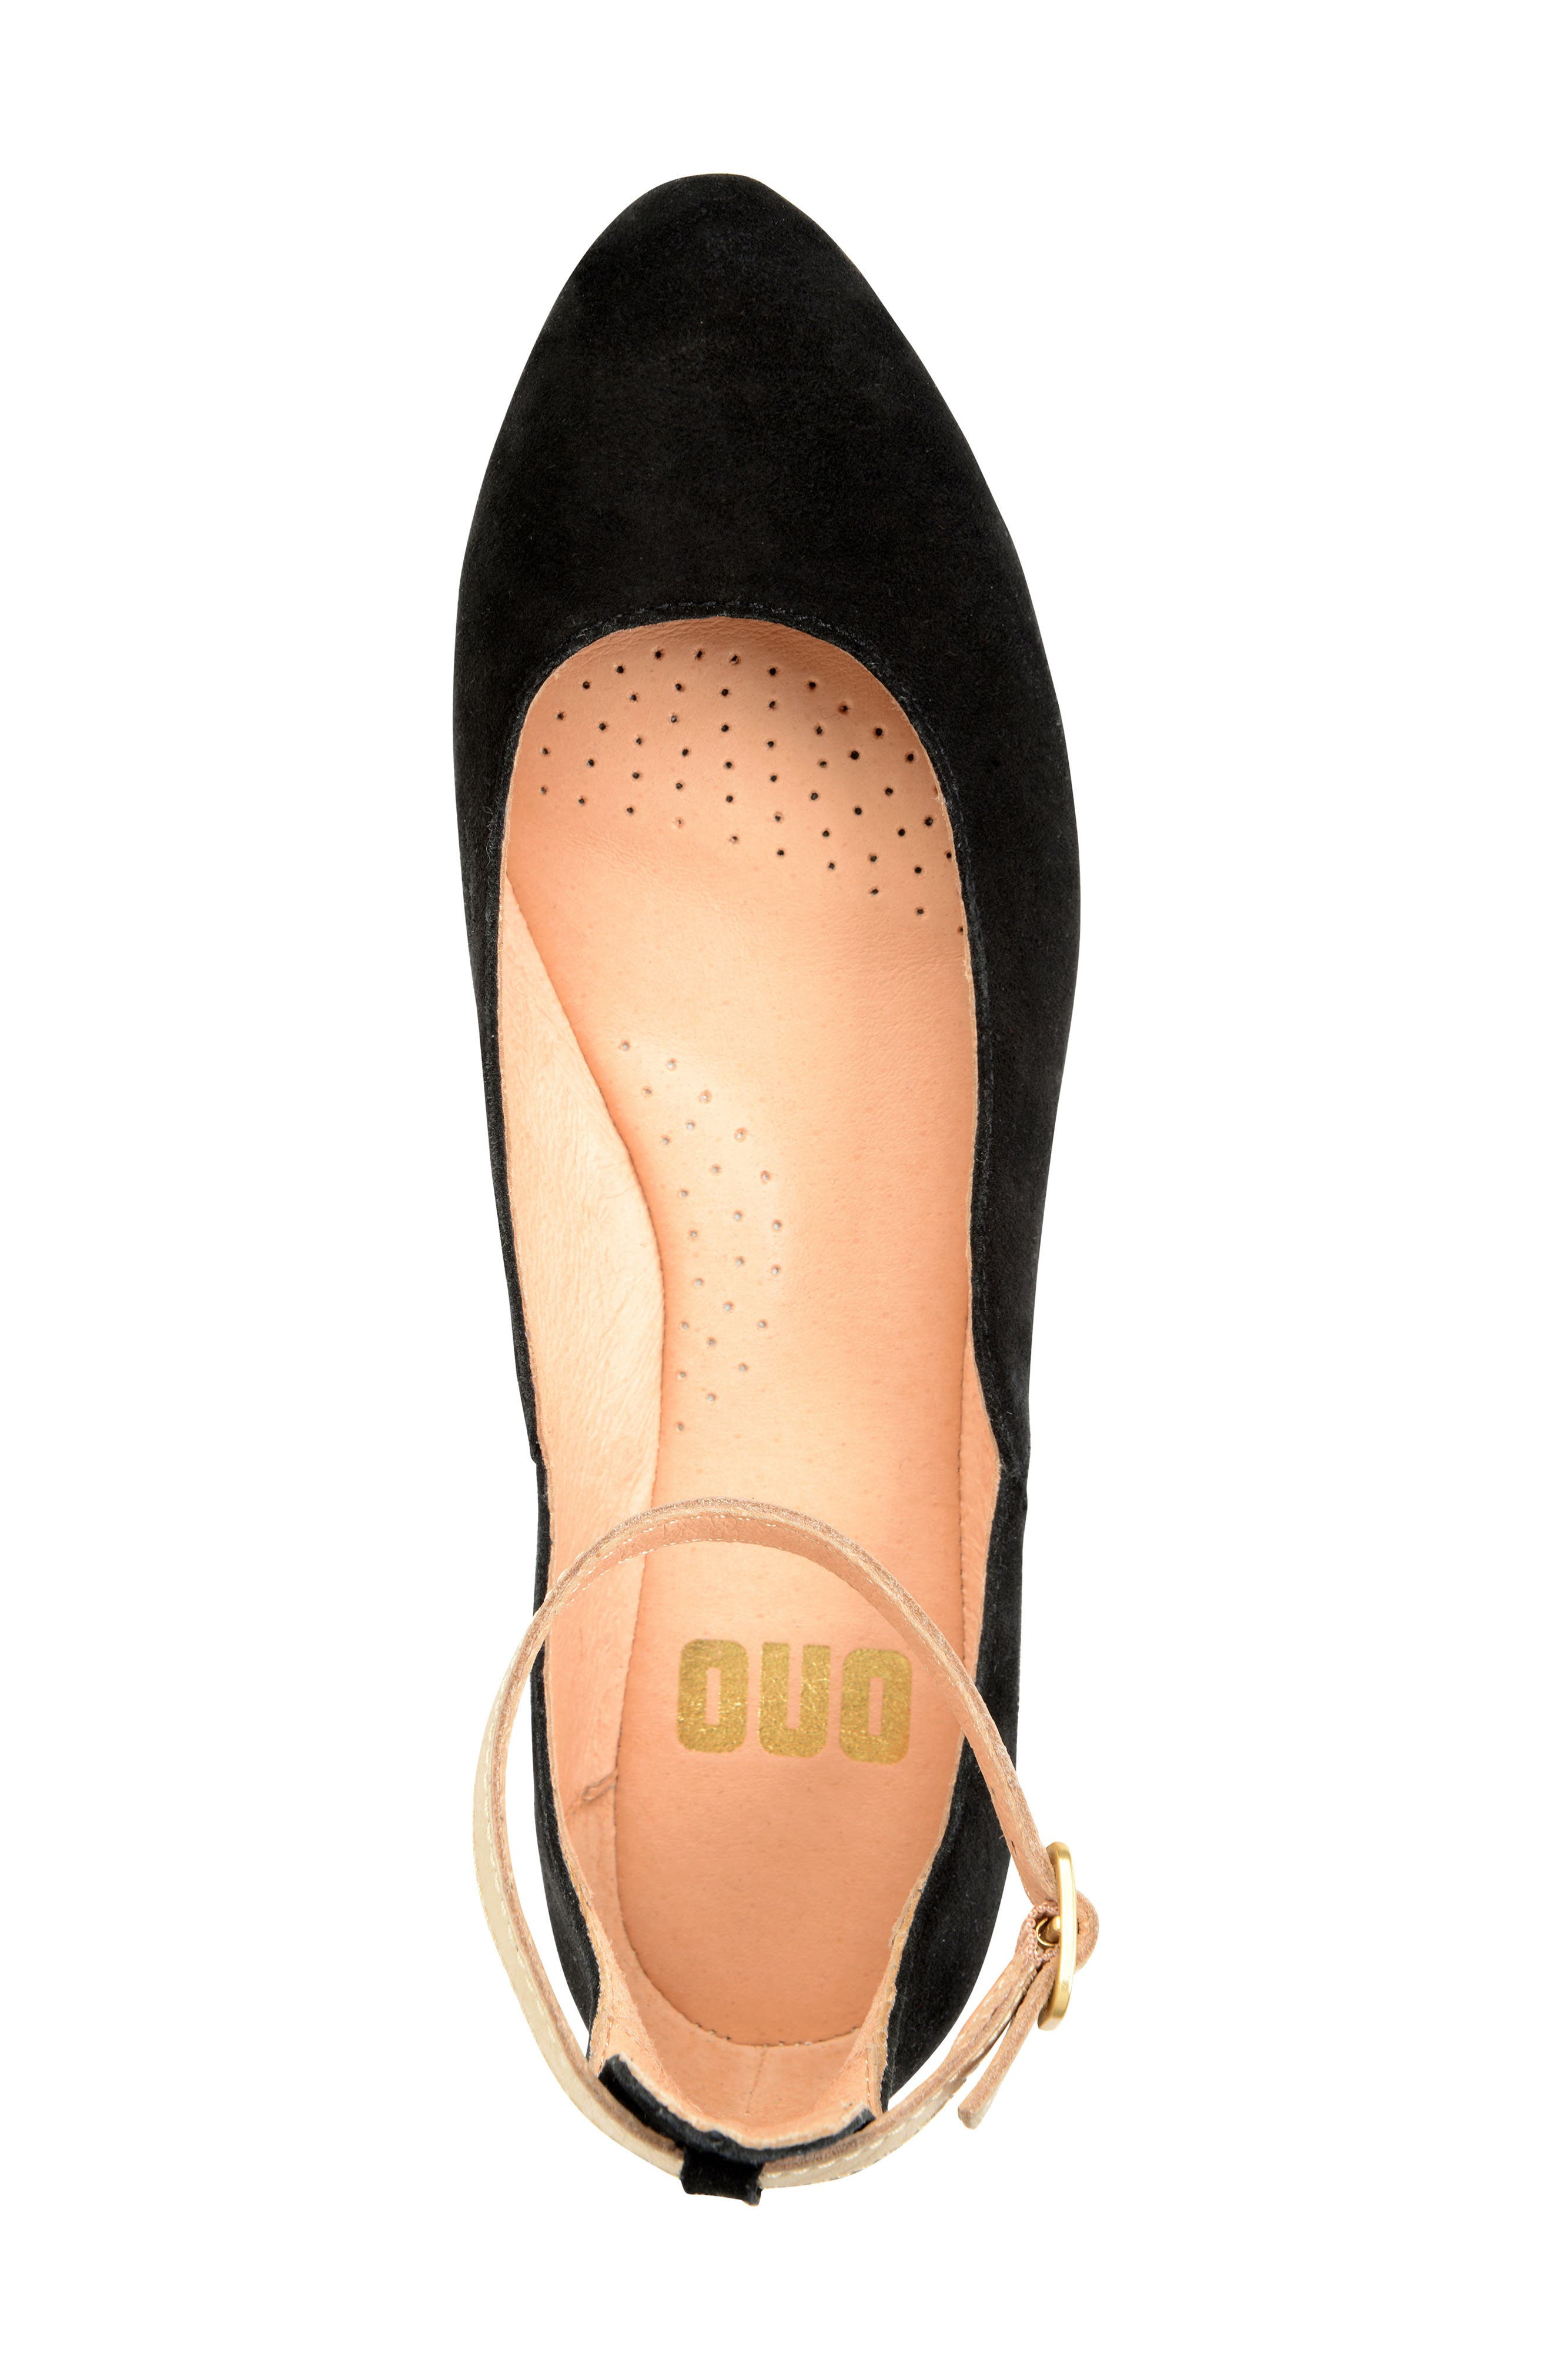 Luchia Ankle Strap Flat,                             Alternate thumbnail 3, color,                             BLACK/ GOLD LEATHER